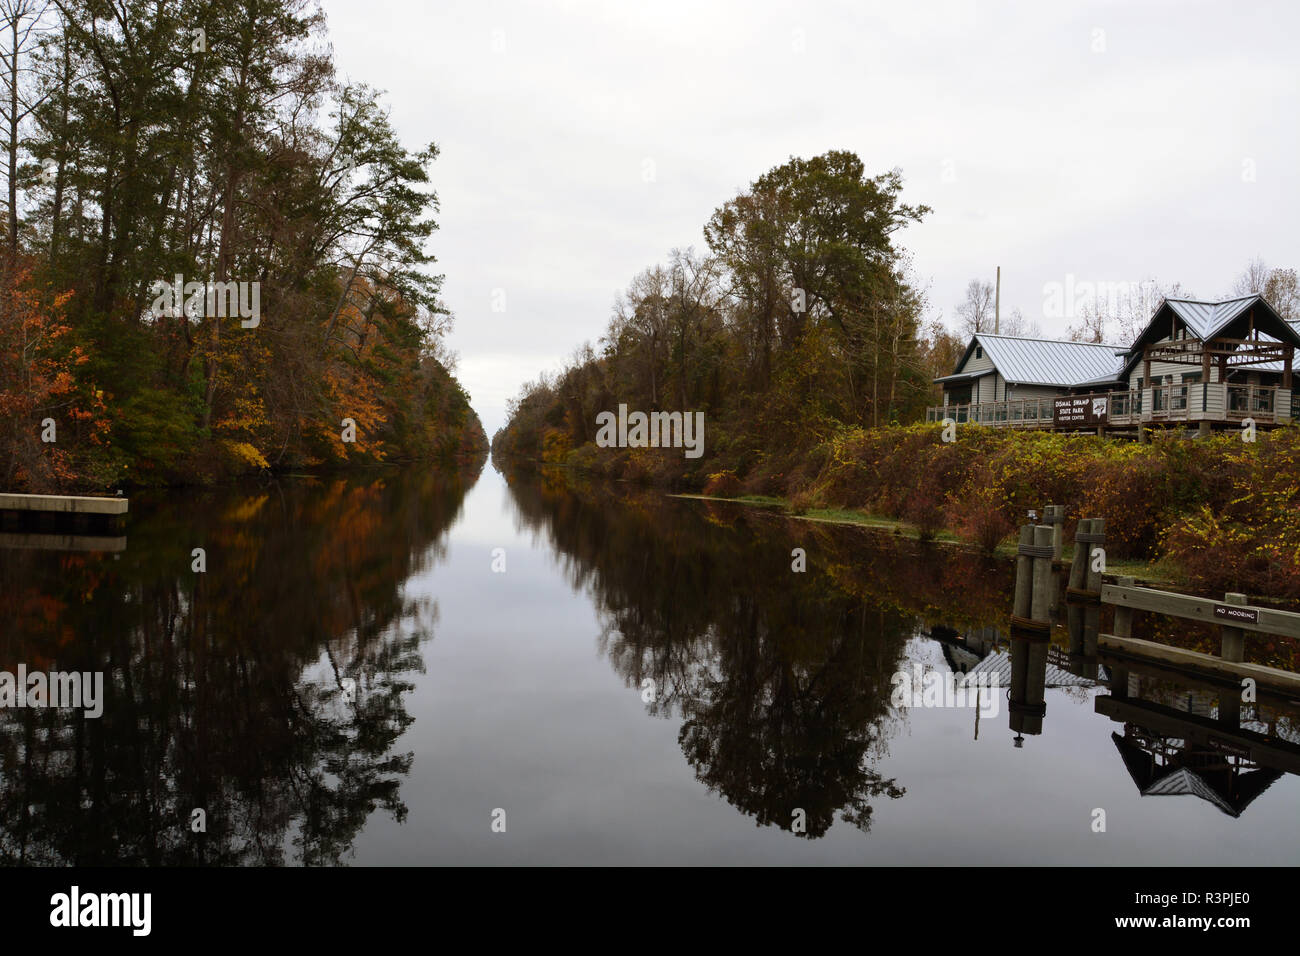 Intracoastal Waterway Stock Photos & Intracoastal Waterway